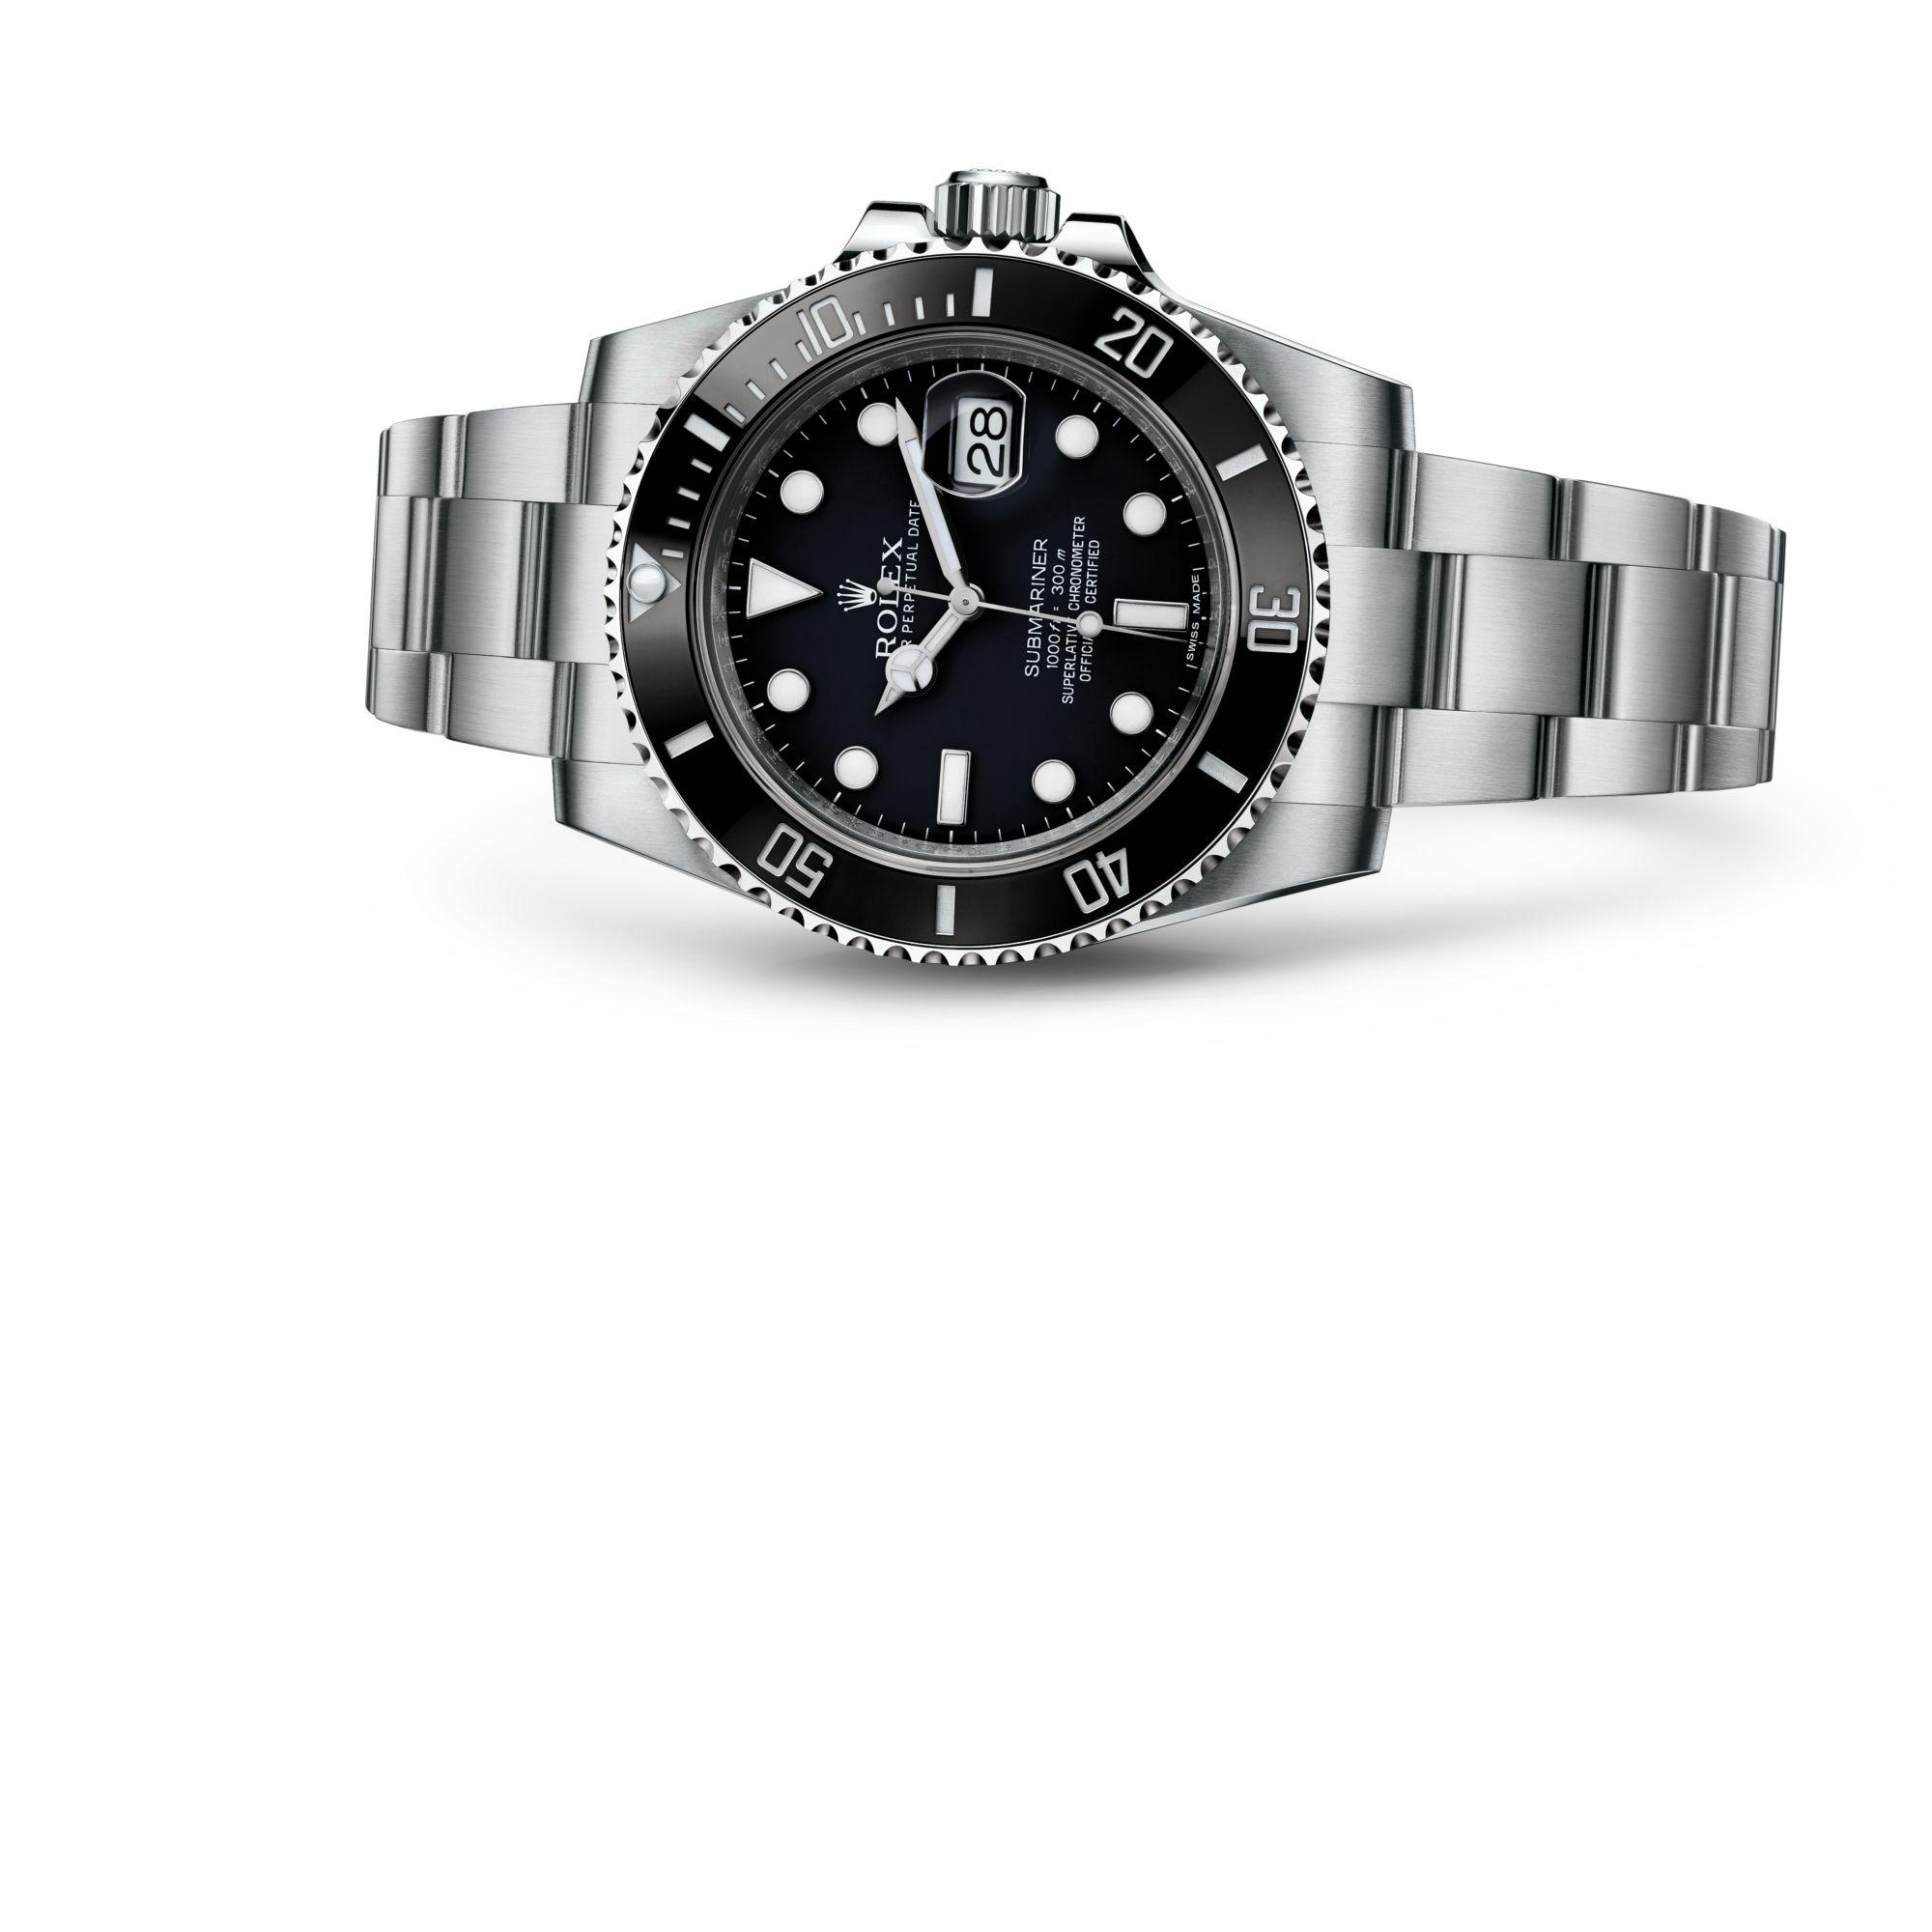 Rolex Submariner Date M116610LN-0001